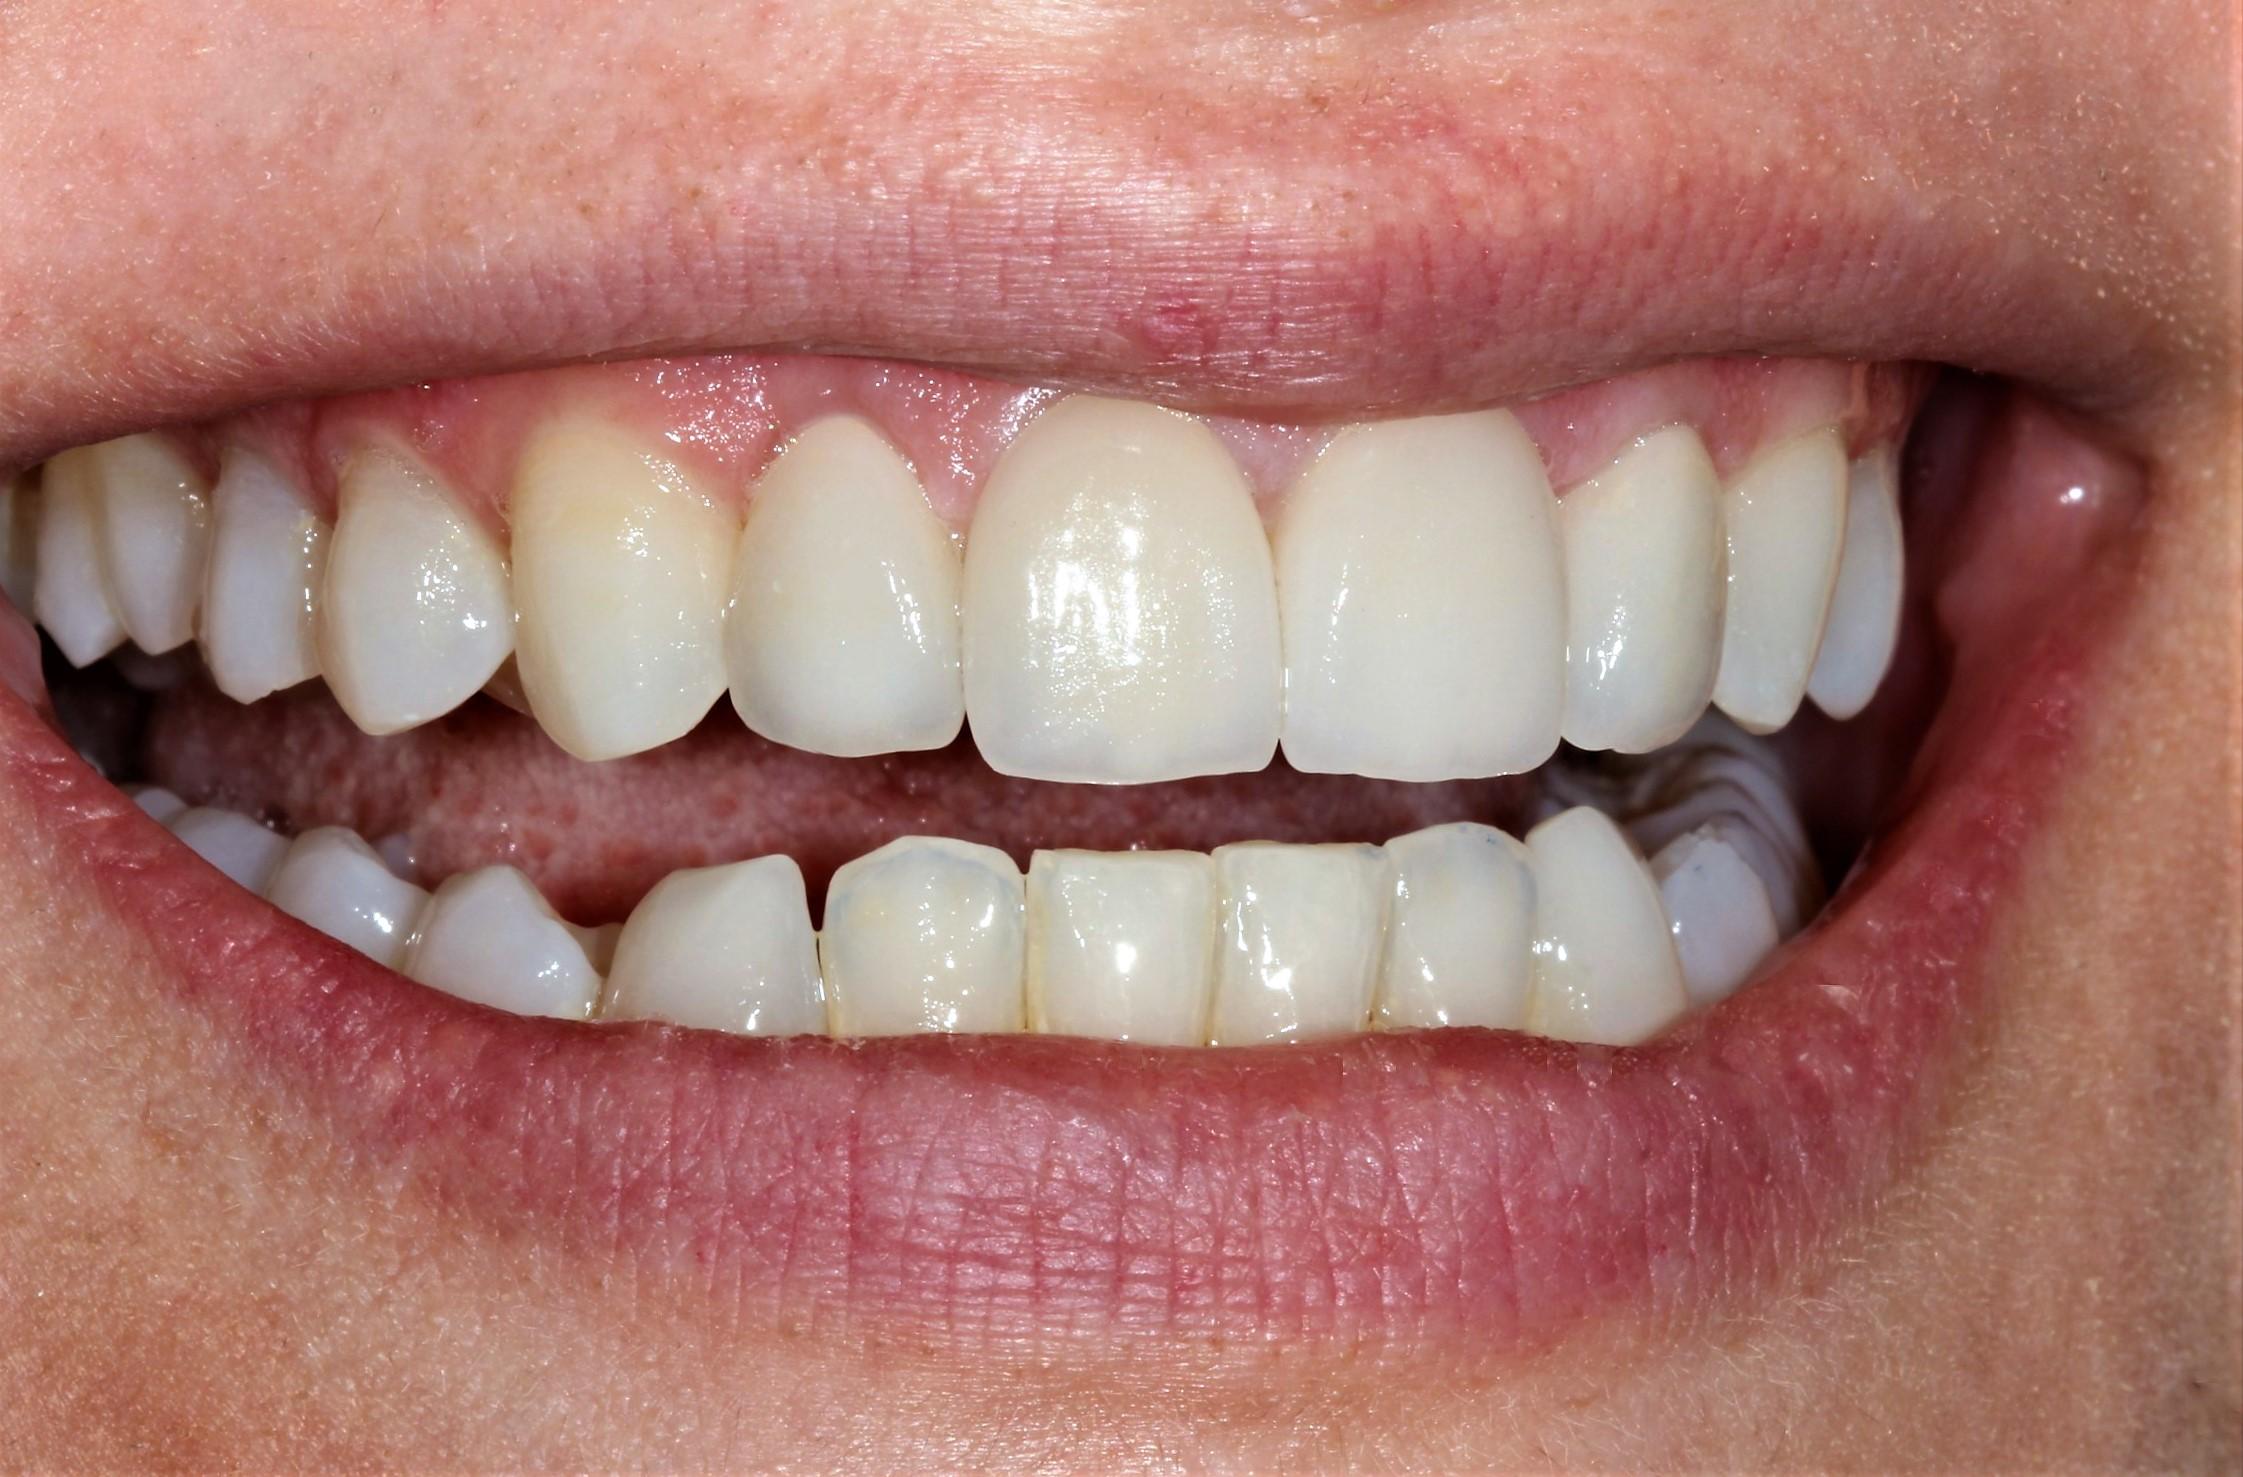 Smile design estetika osmijeha keramičke ljuskice